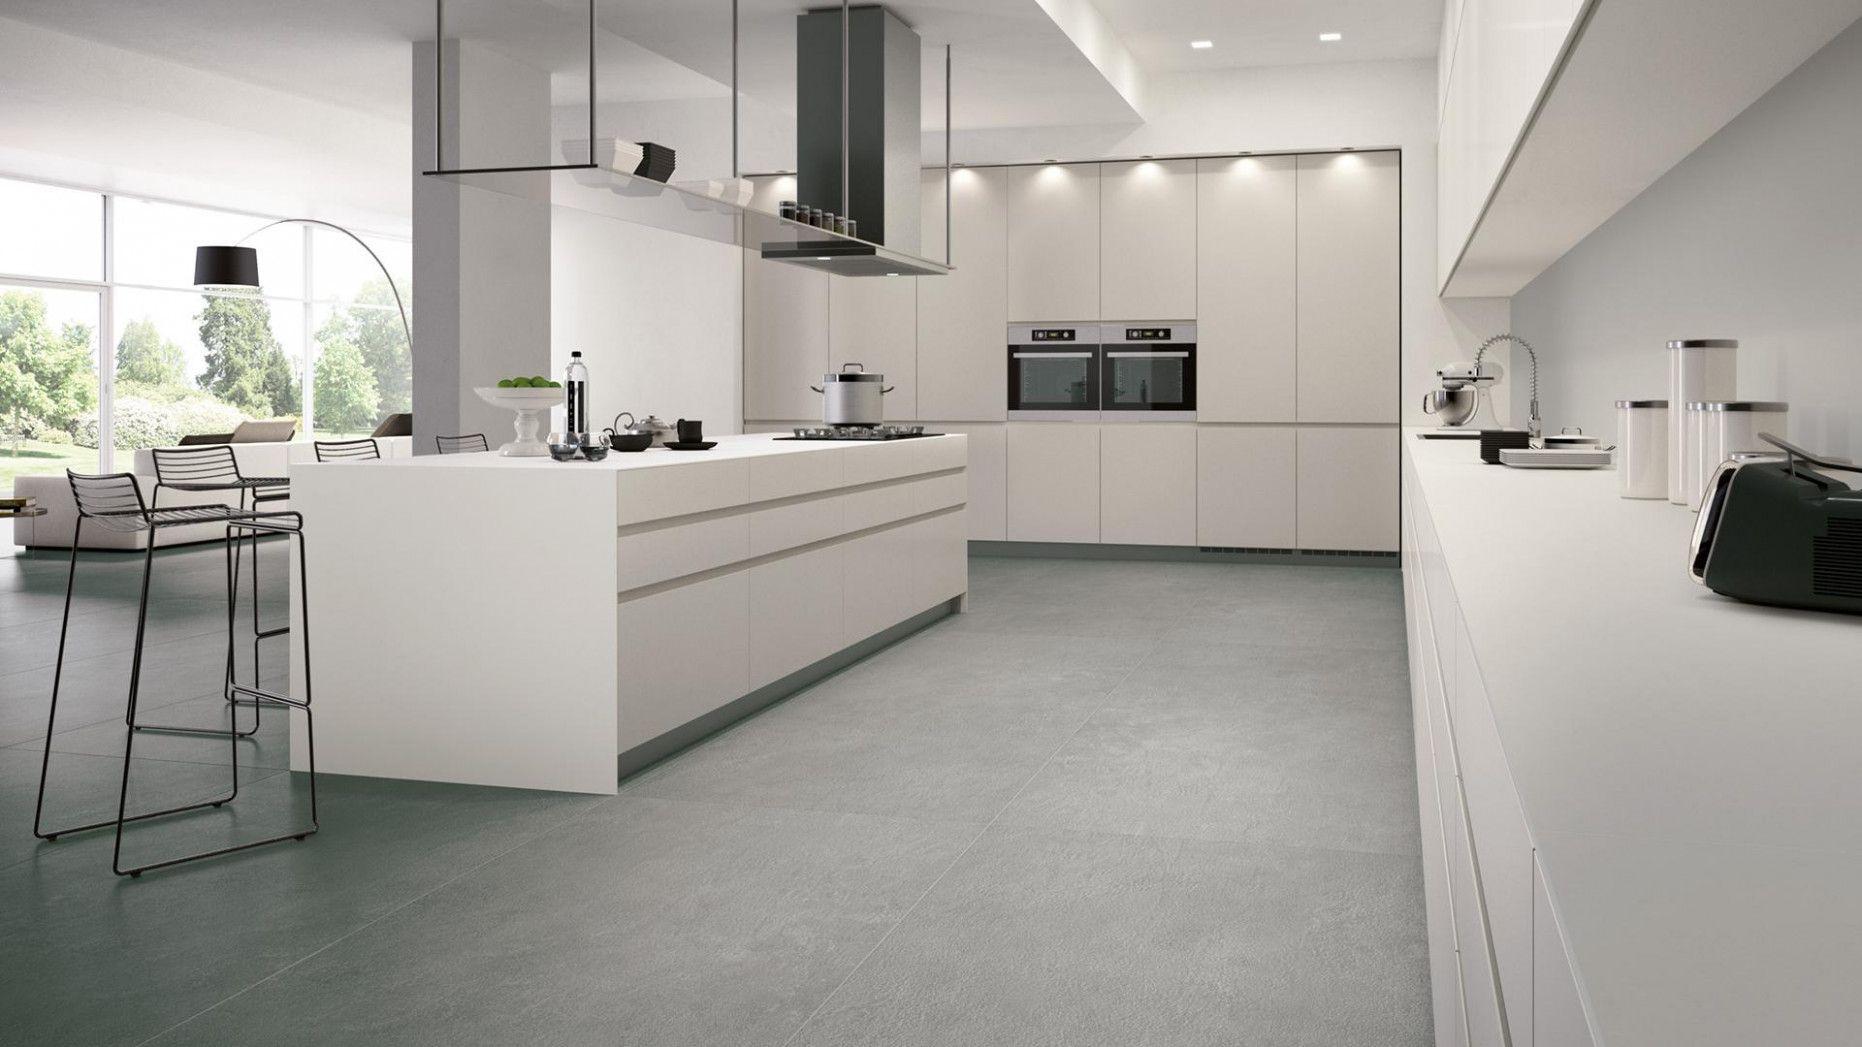 13 graue küche fliesen | fliesen küche, design bodenbelag